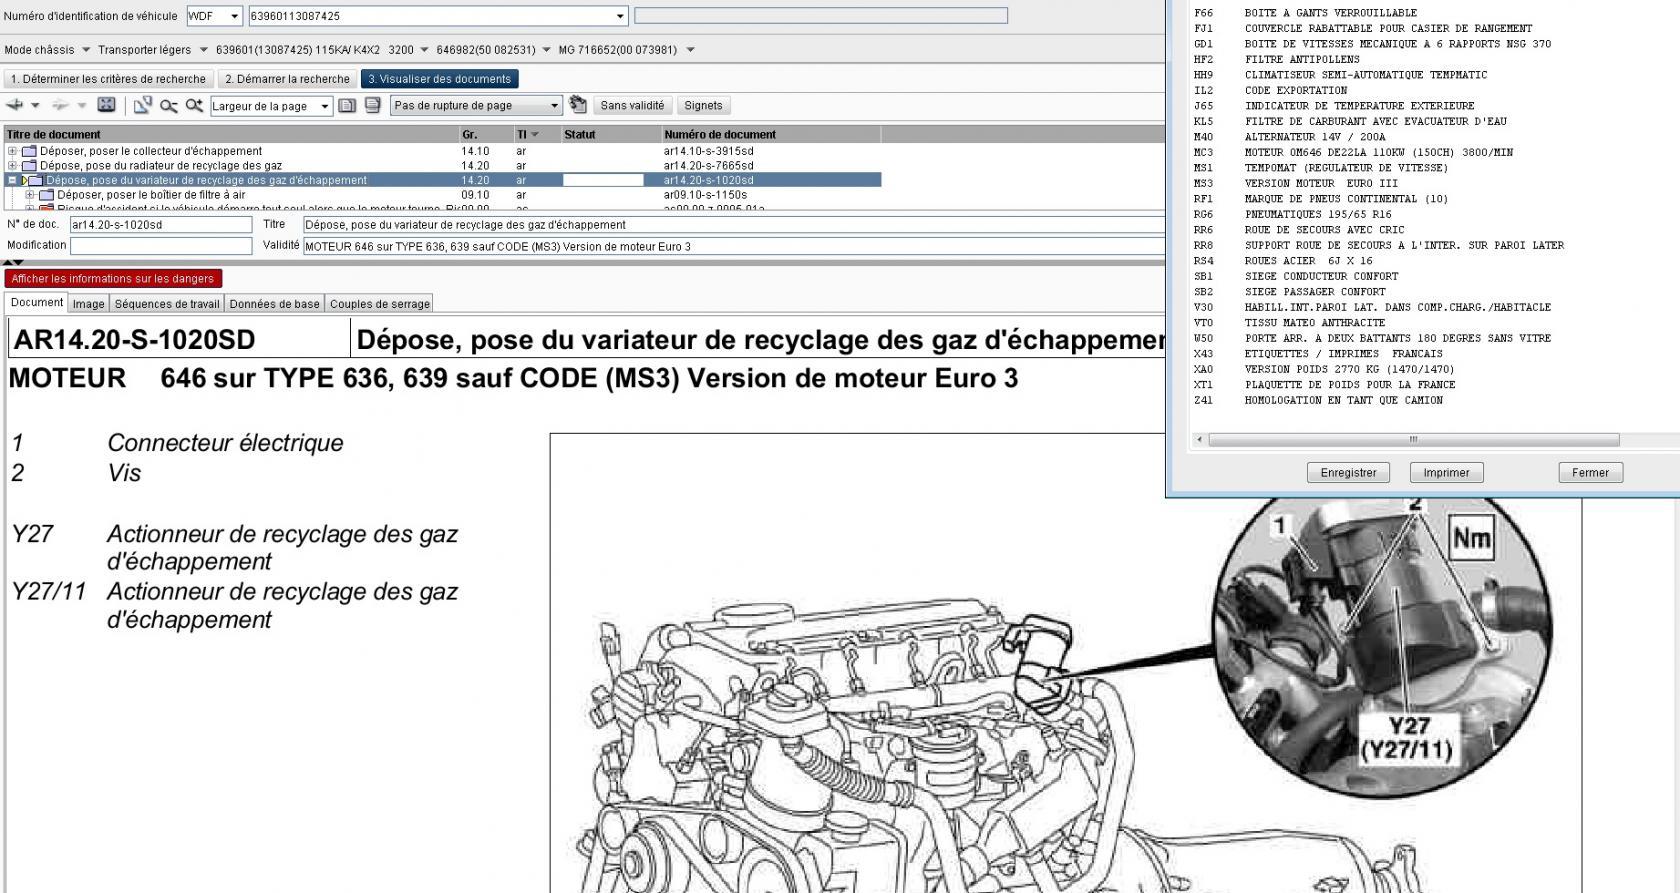 regulation-pression-suralimentation-9-WDF63960113087425.jpeg